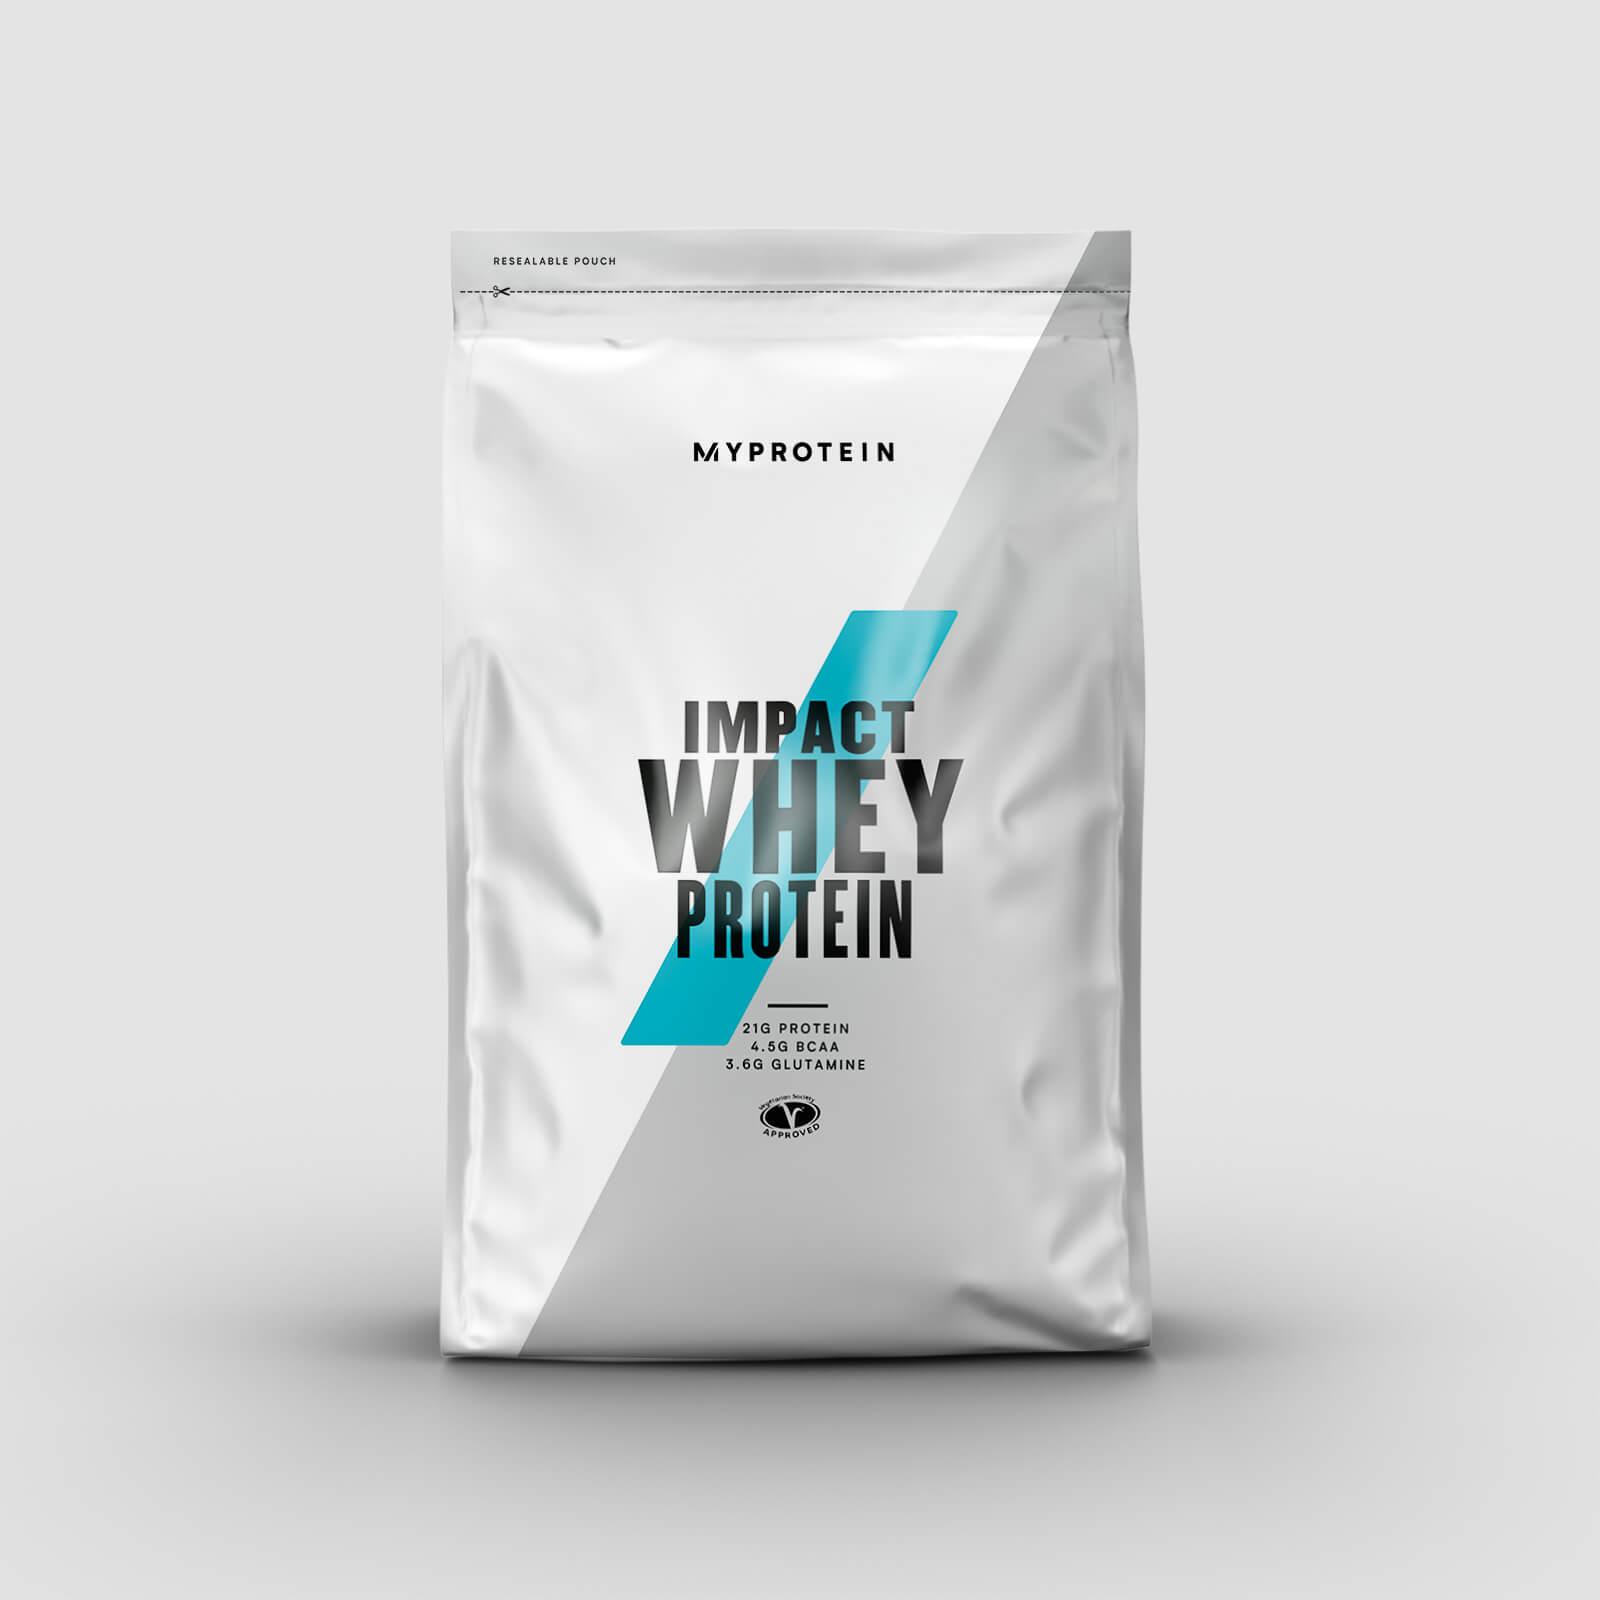 Myprotein Impact Whey Protein - 5kg - Noix De Coco